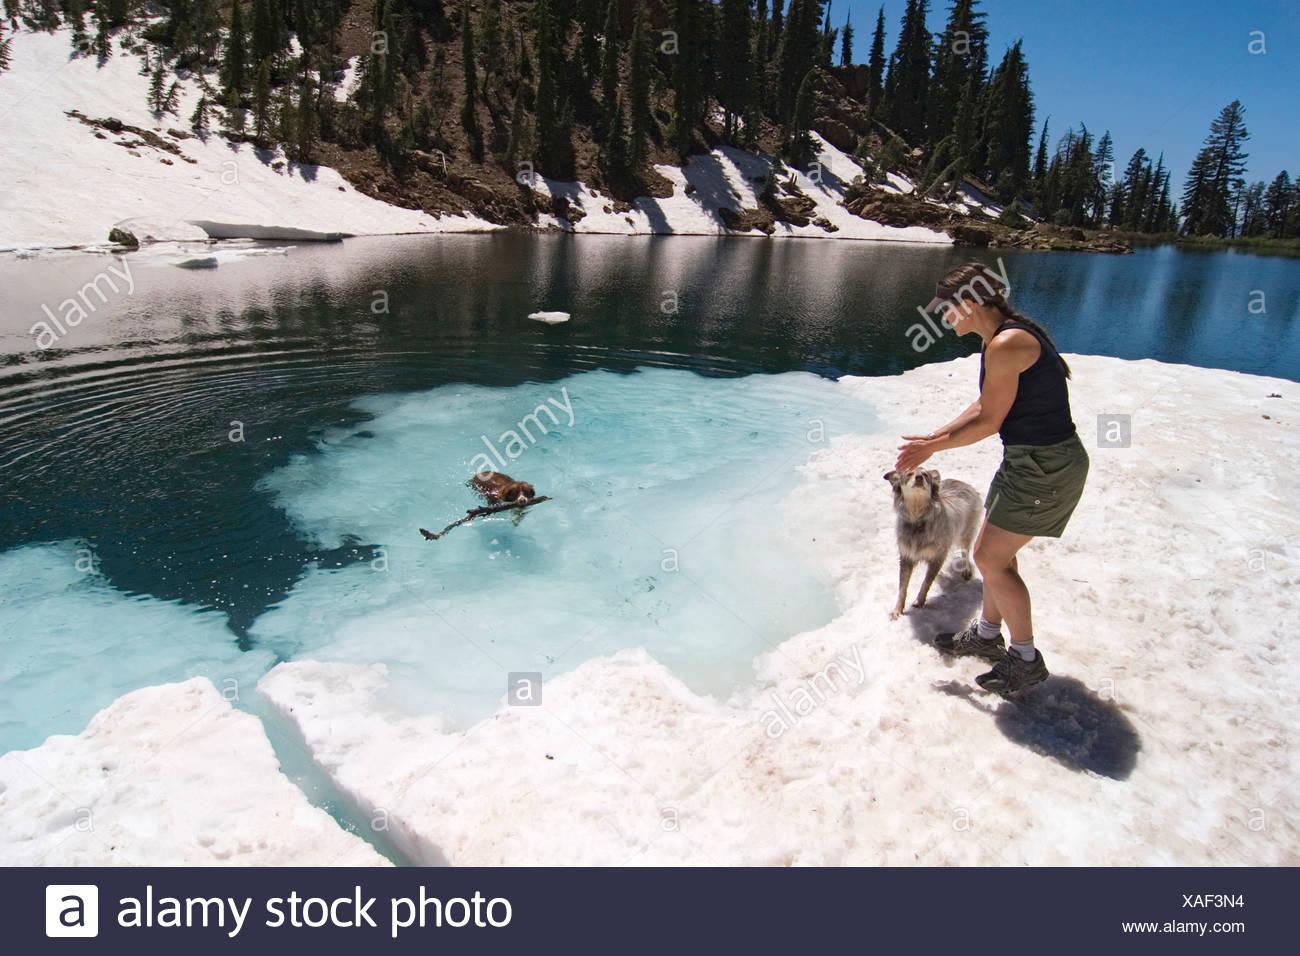 Dog fetching a stick in a lake, Lake Tahoe, Californian Sierra Nevada, California, USA - Stock Image